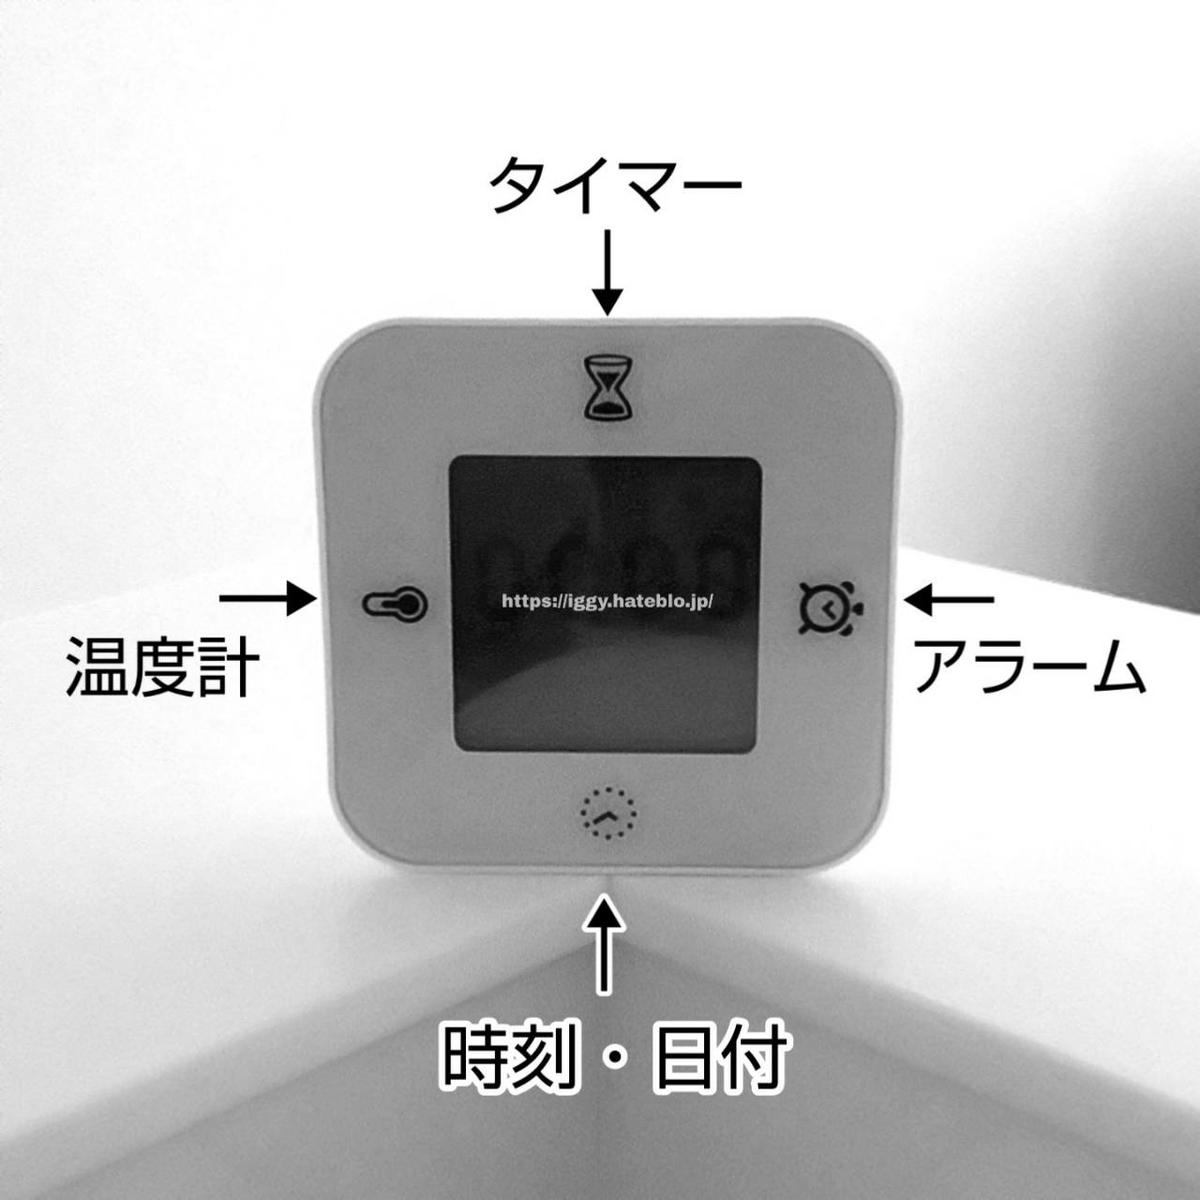 IKEA クロッキス① iggy2019